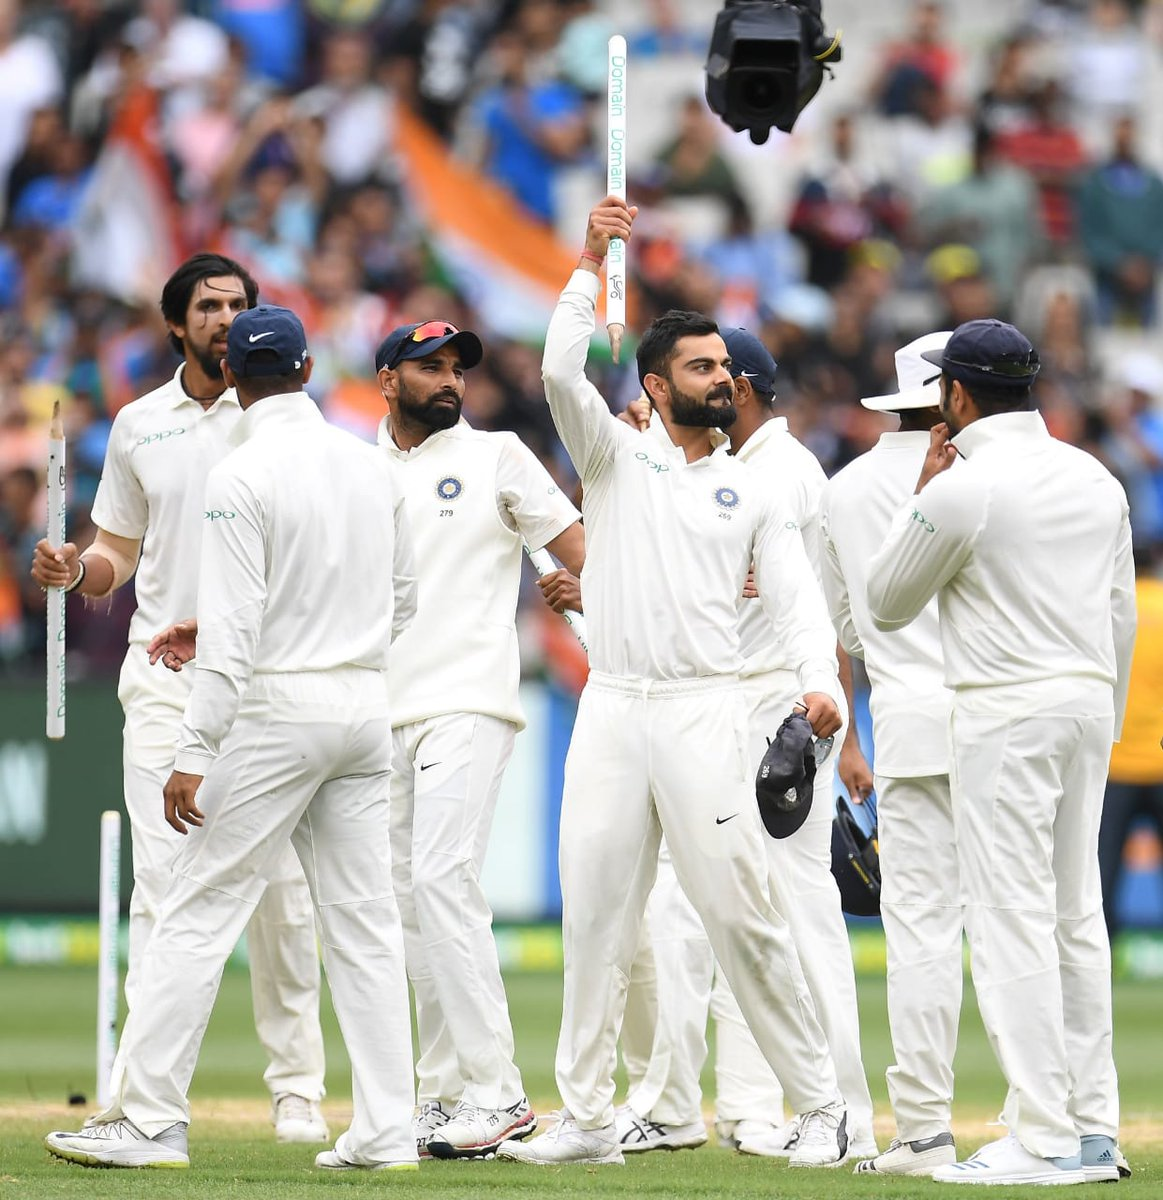 Virat Kohli as Test Captain at Home  3-0 vs South Africa 3-0 vs New Zealand 4-0 vs England 1-0 vs Bangladesh 2-1 vs Australia 1-0 vs Sri Lanka 2-0 vs West Indies 3-0 vs South Africa*  @imVkohli #ViratKohli #KingKohli #INDvsSA<br>http://pic.twitter.com/YYPgRanWVX